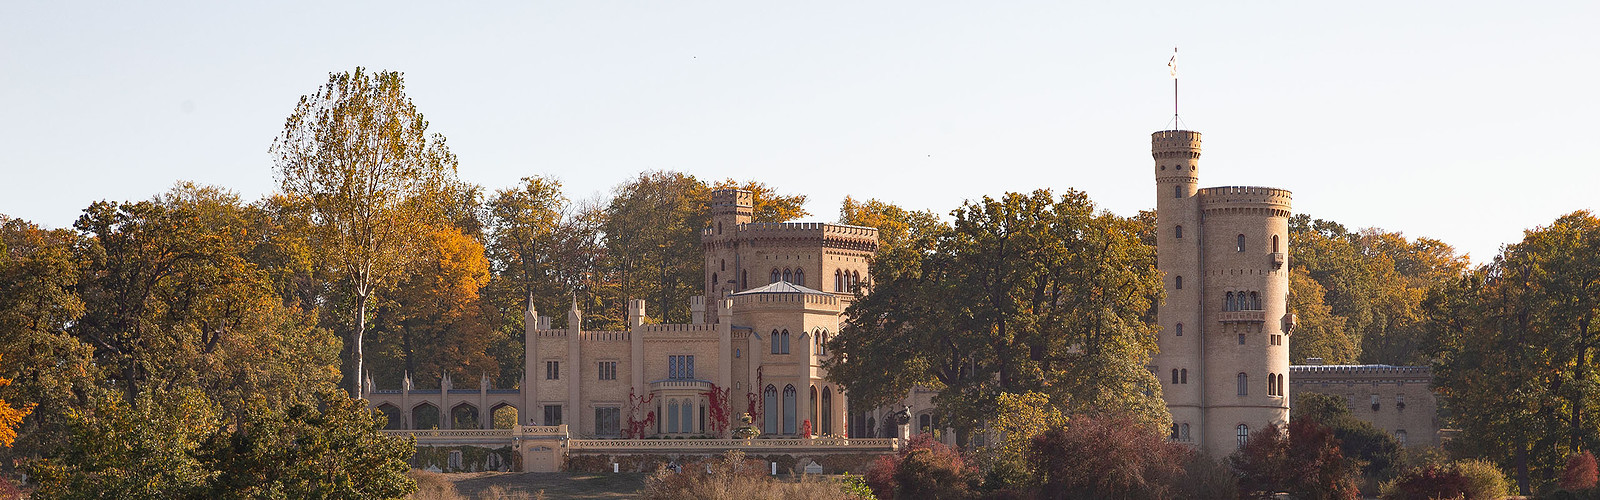 Kanu vor Schloss Babelsberg (c) SPSG PMSG André Stiebitz